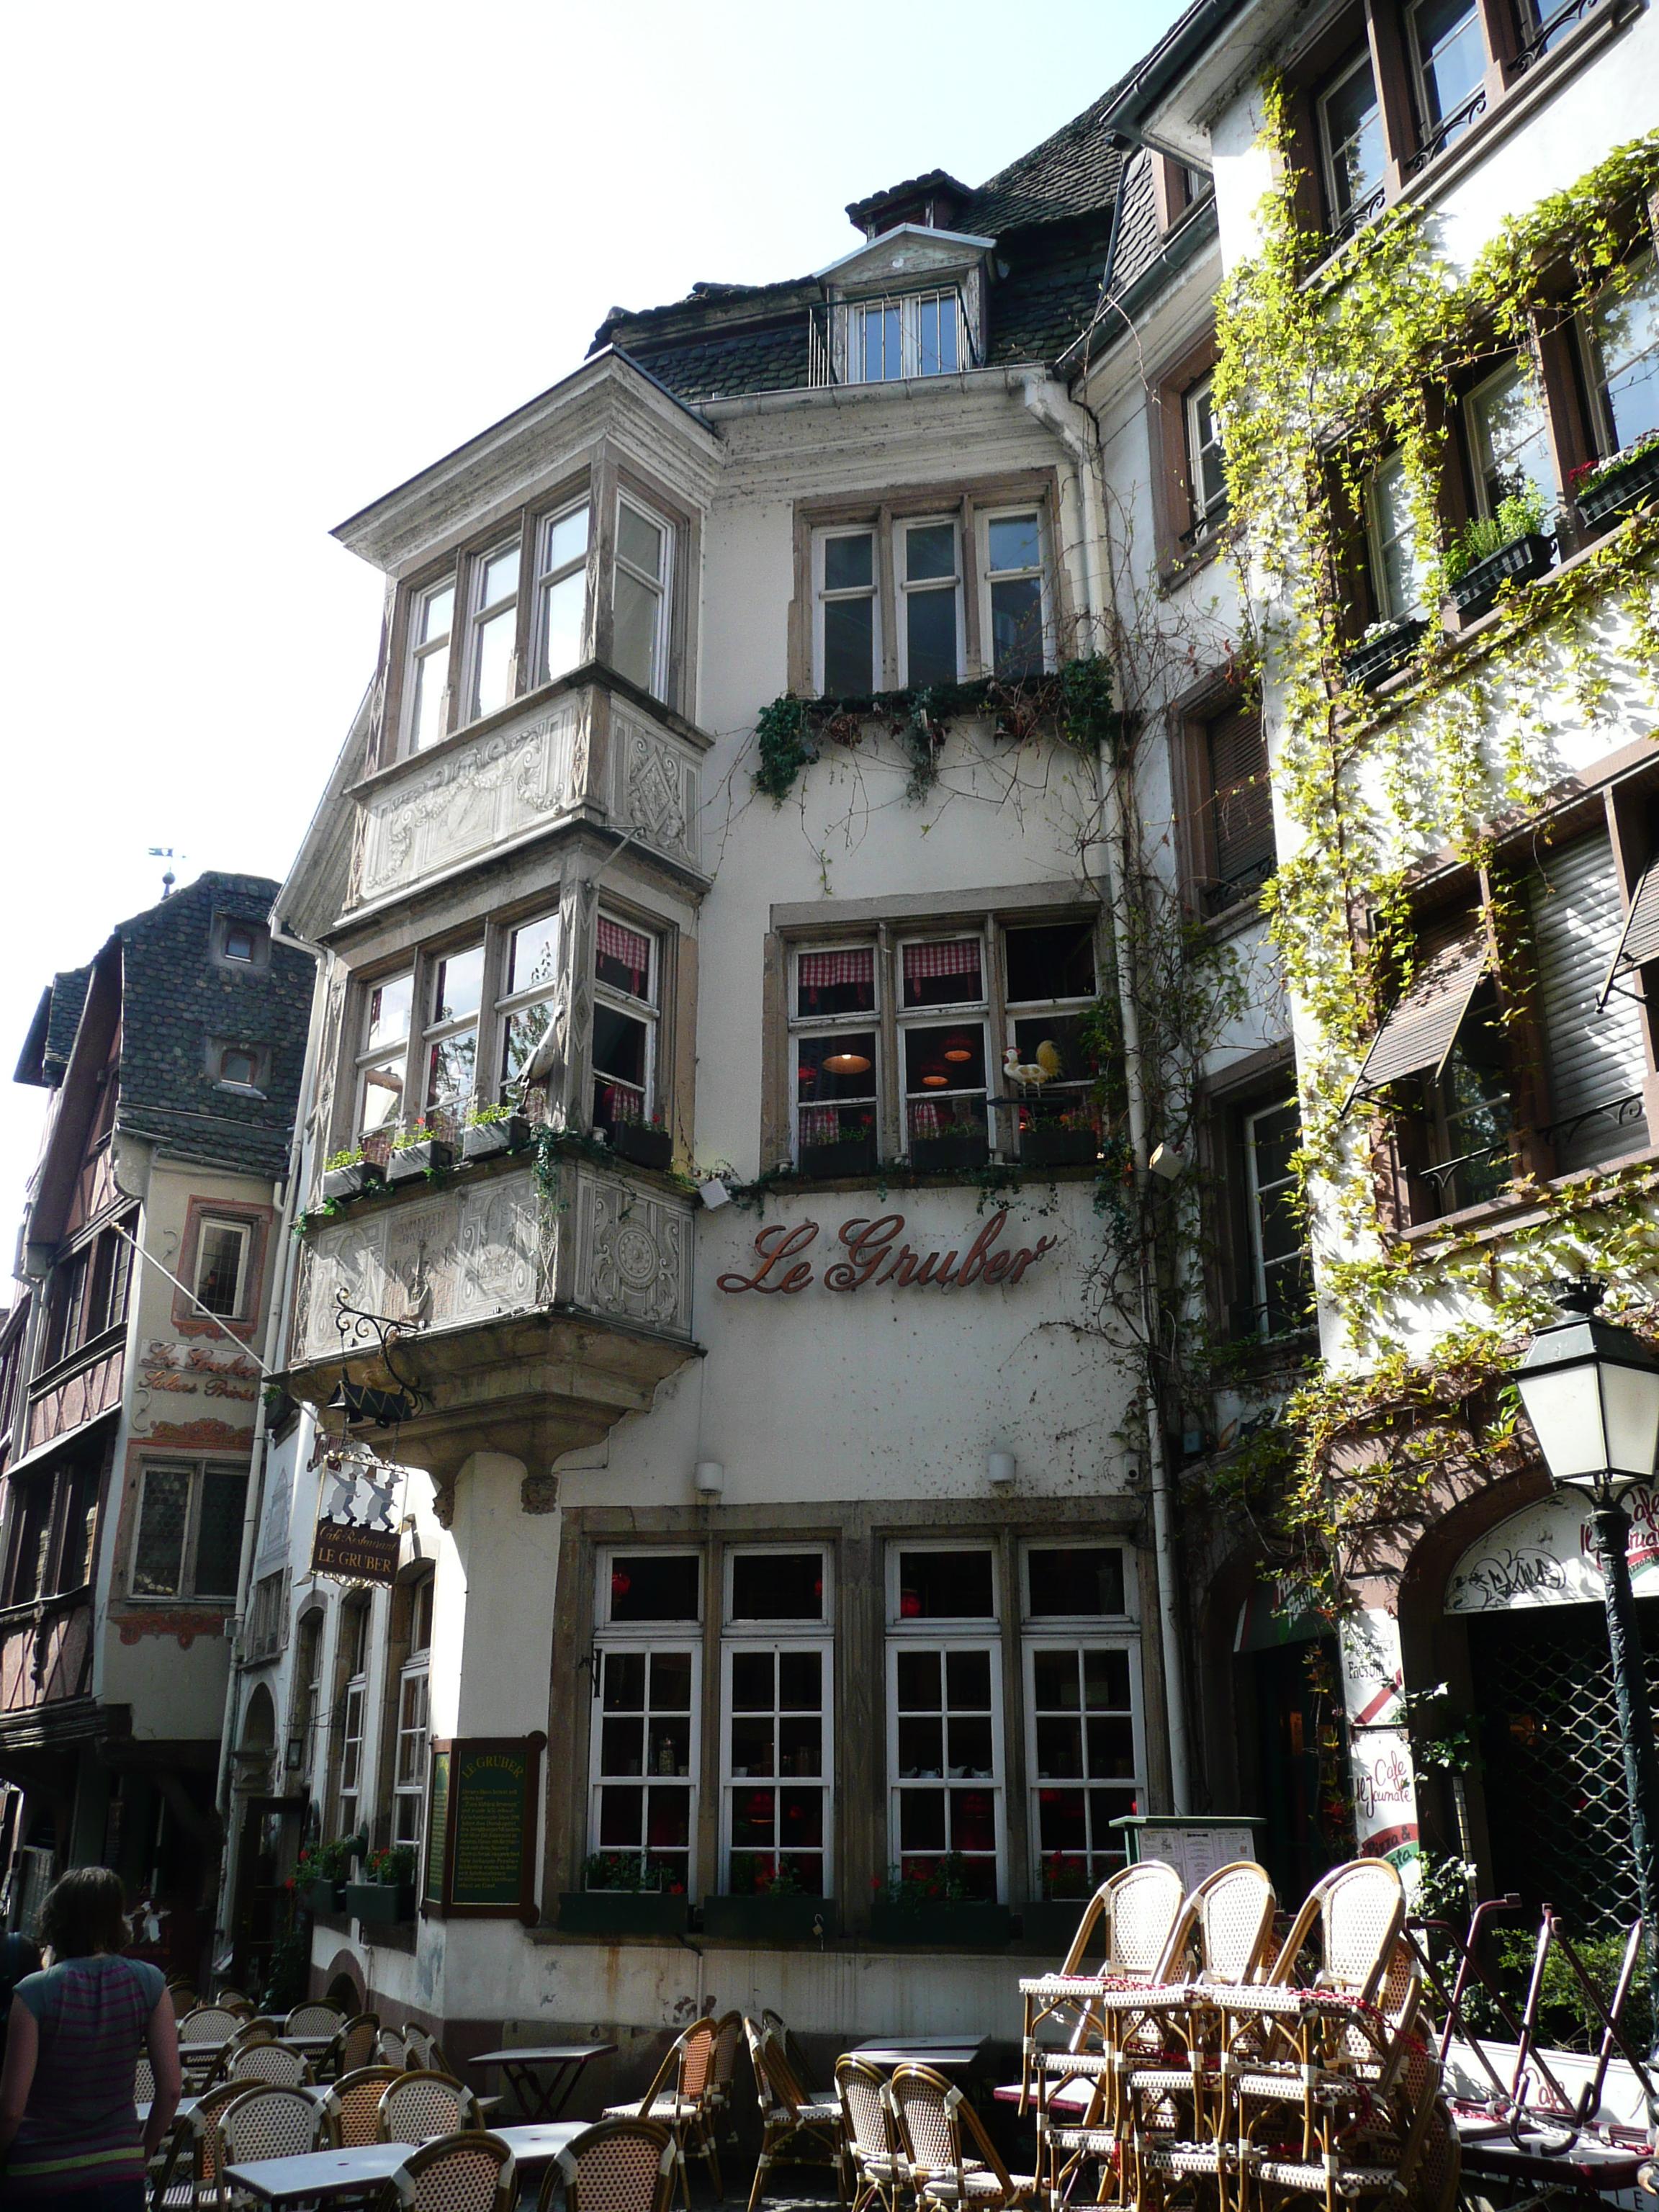 Maison au 11 rue du maroquin strasbourg wikiwand for Reso strasbourg